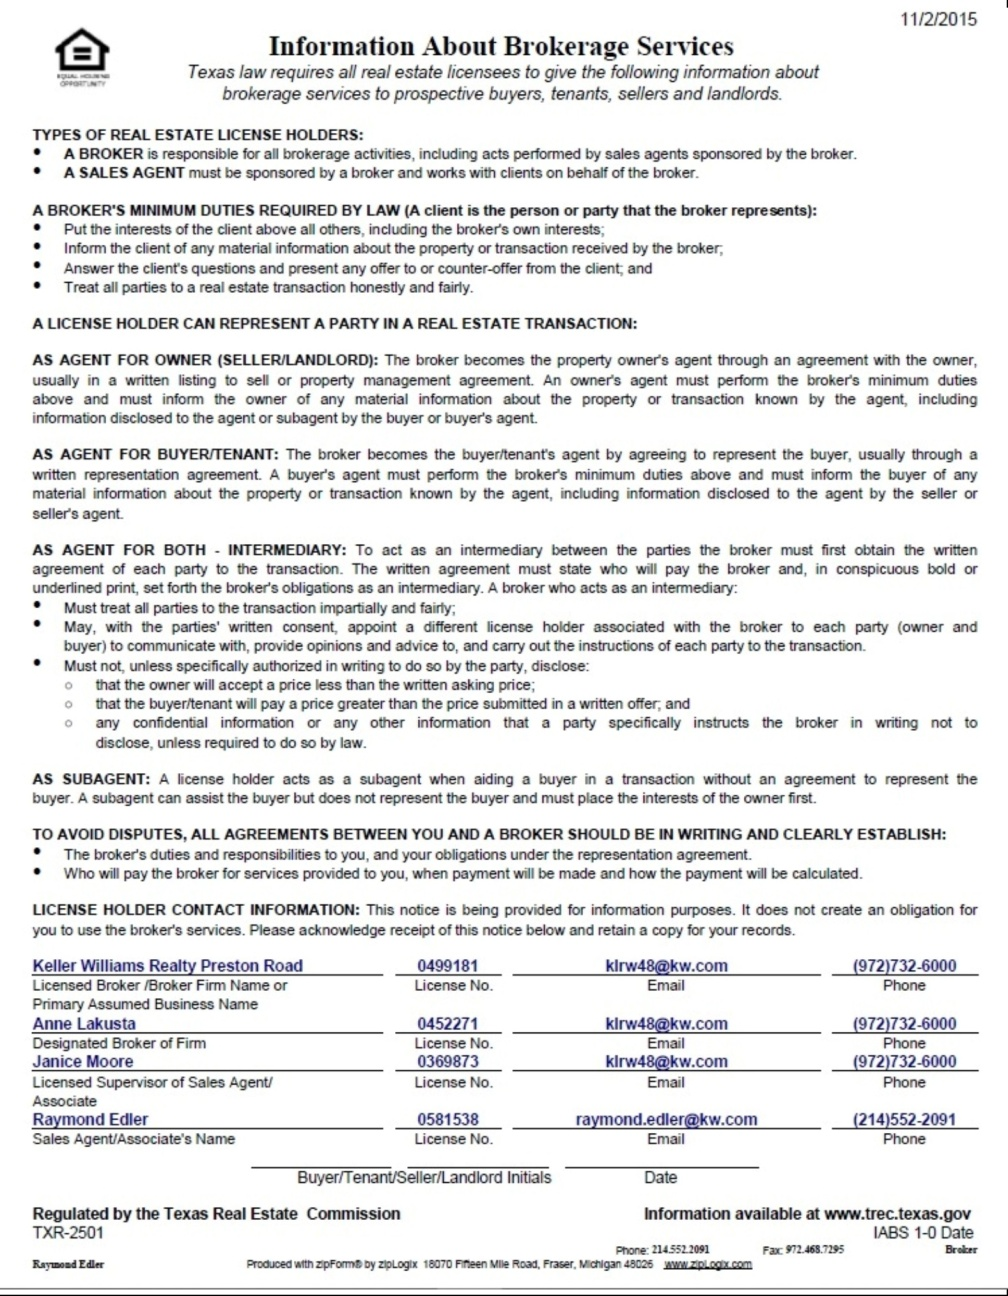 Texas Real Estate Commission (TREC) Information About Brokerage Services Form Edler